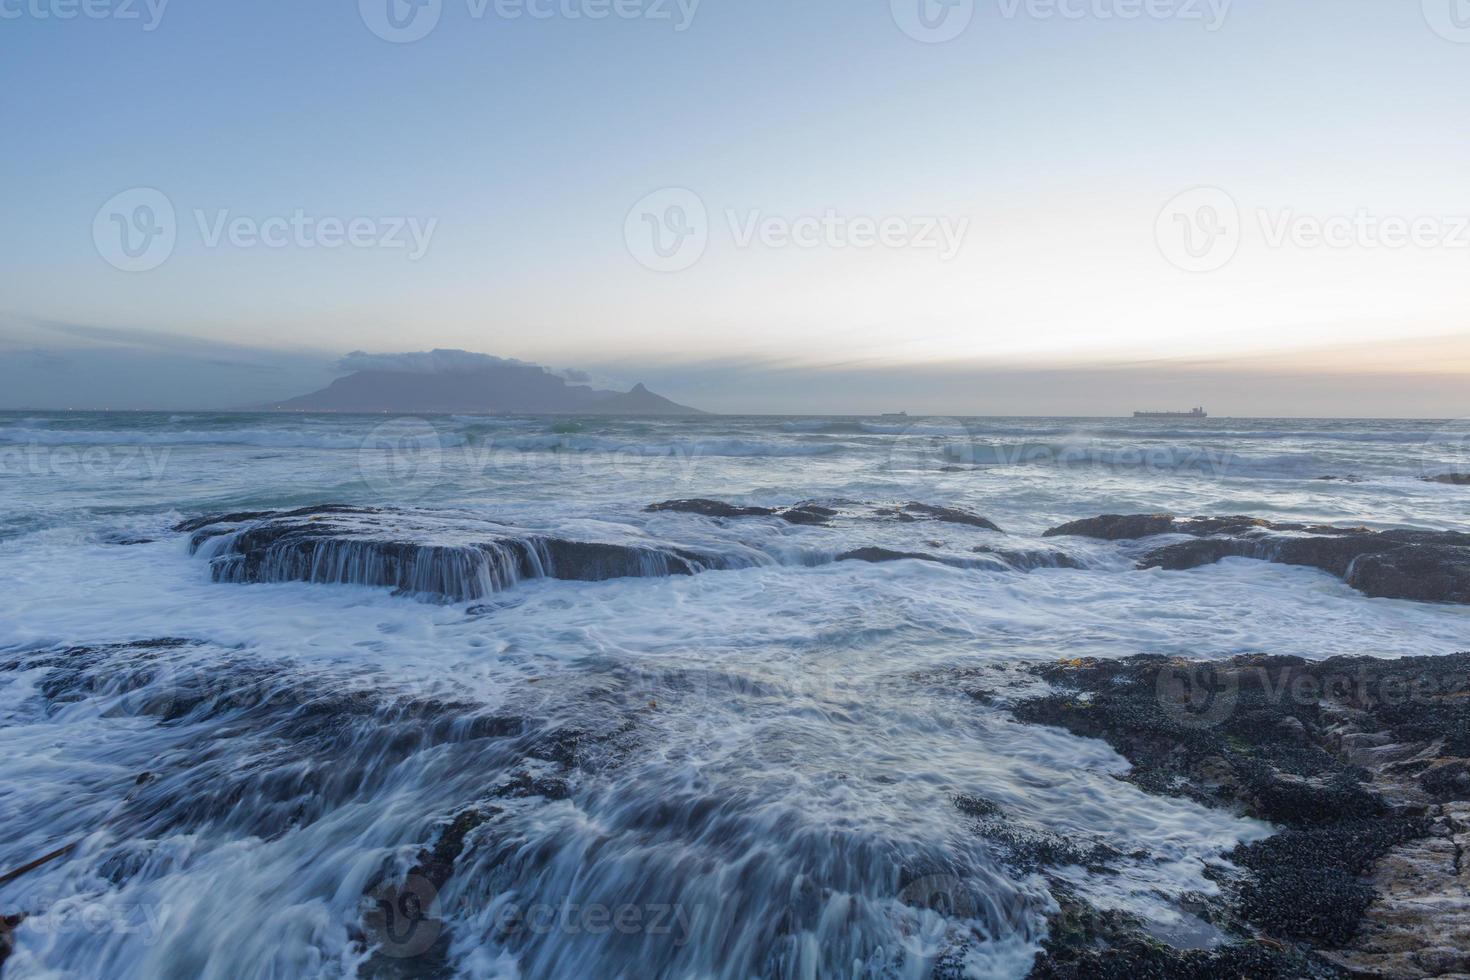 ondas quebrando sobre rochas foto